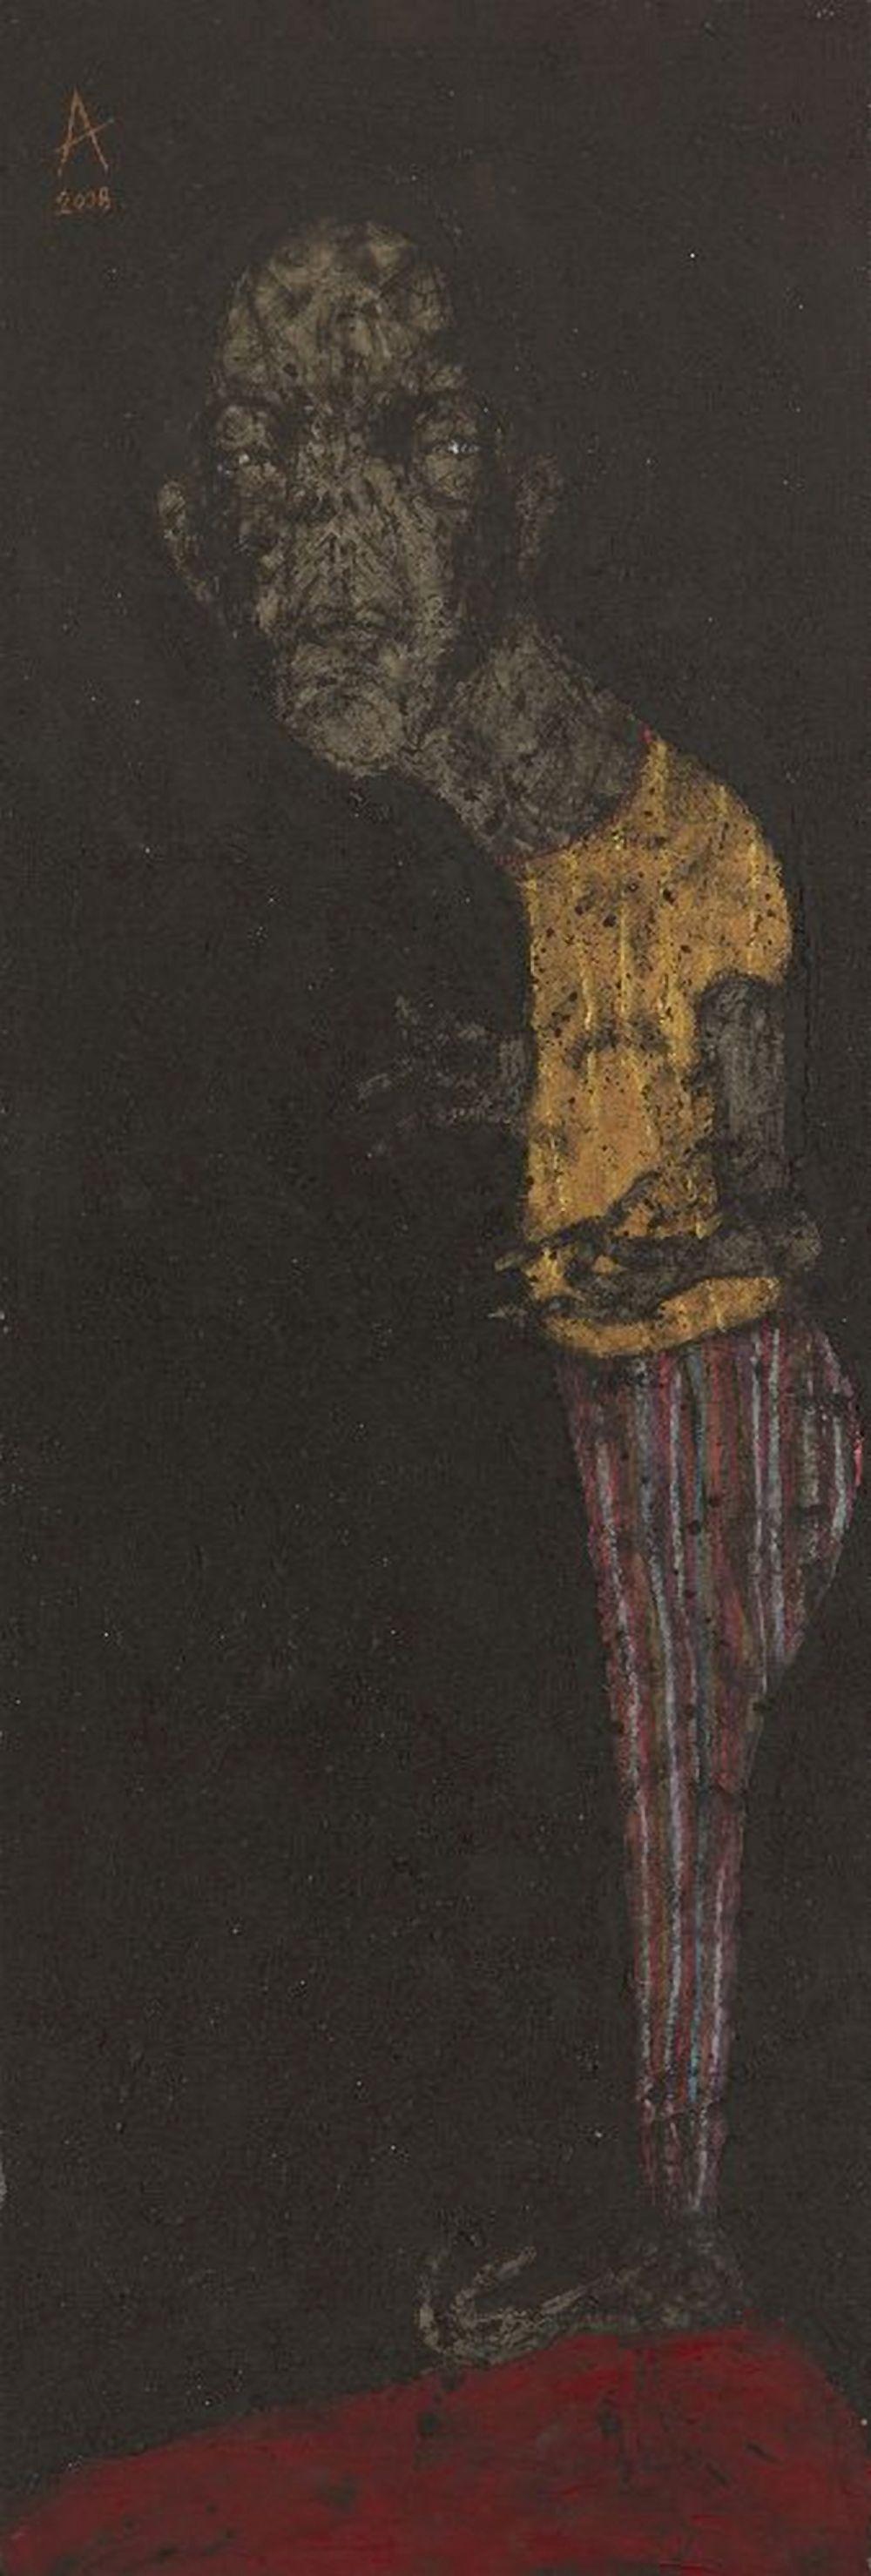 Sabhan Adam (Syrian, b. 1972), Untitled, 2007, mixed media on canvas, signe